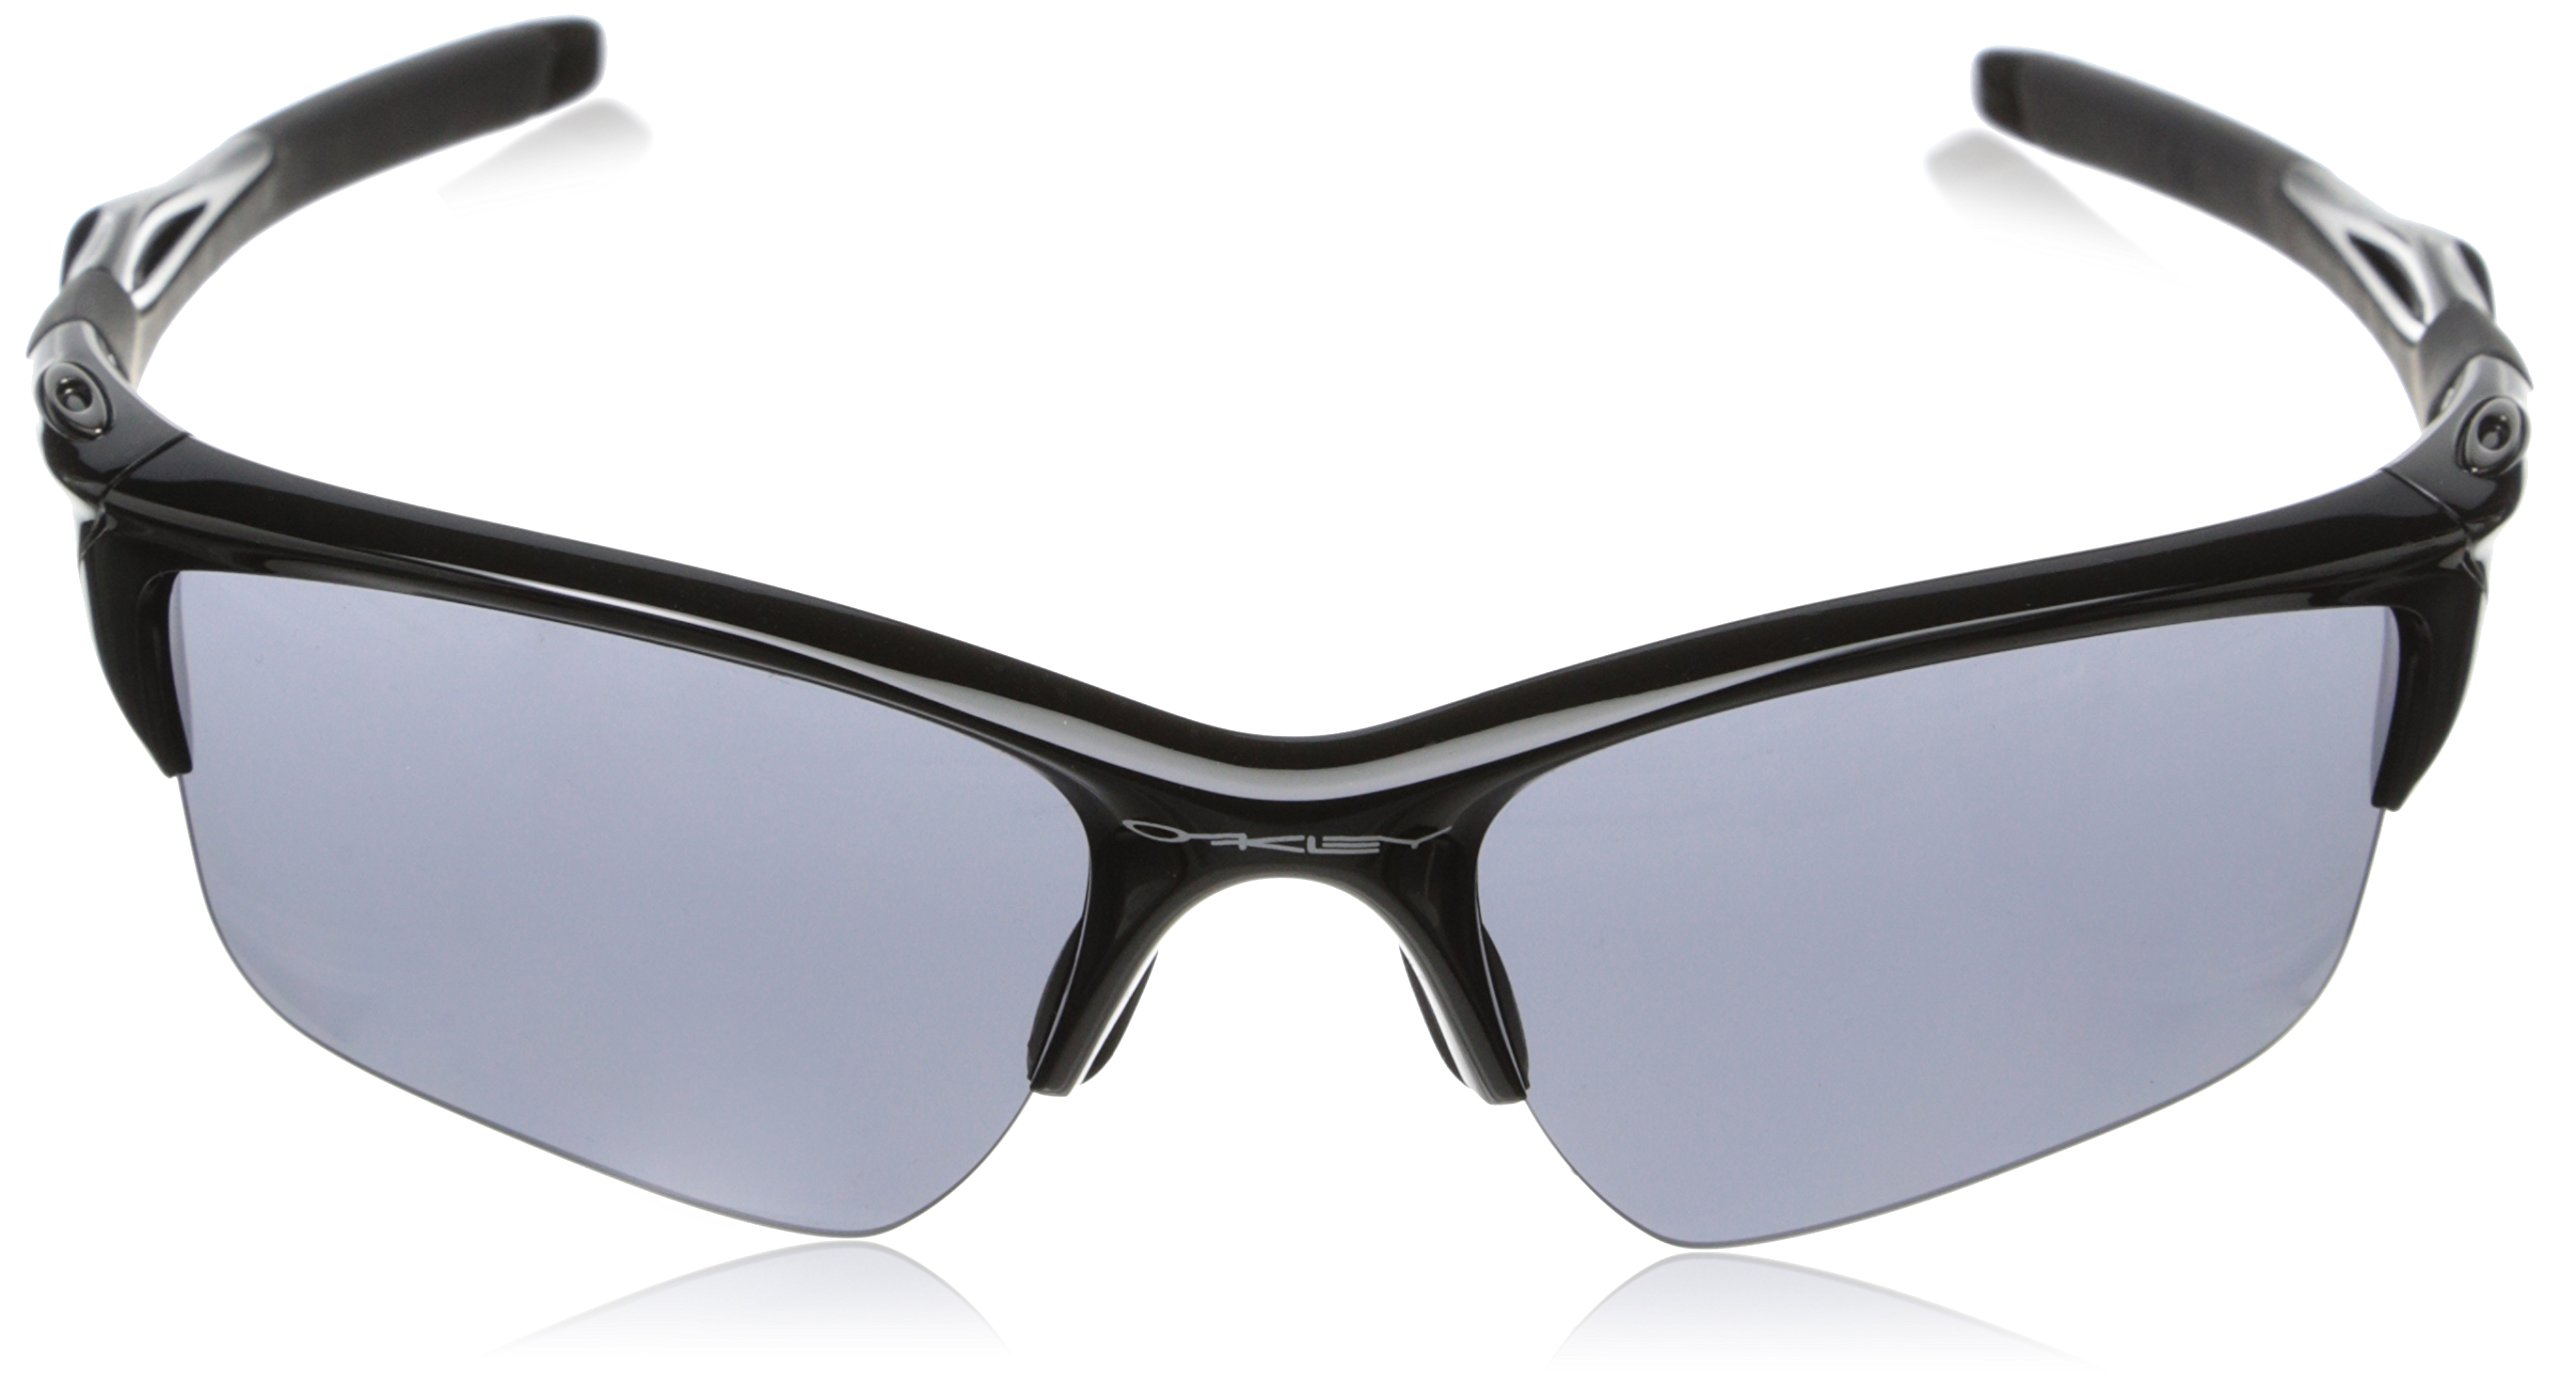 fe61bd9e00f2e Buyr.com - Oakley Men s Half Jacket 2.0 Square XL Eyeglasses ...